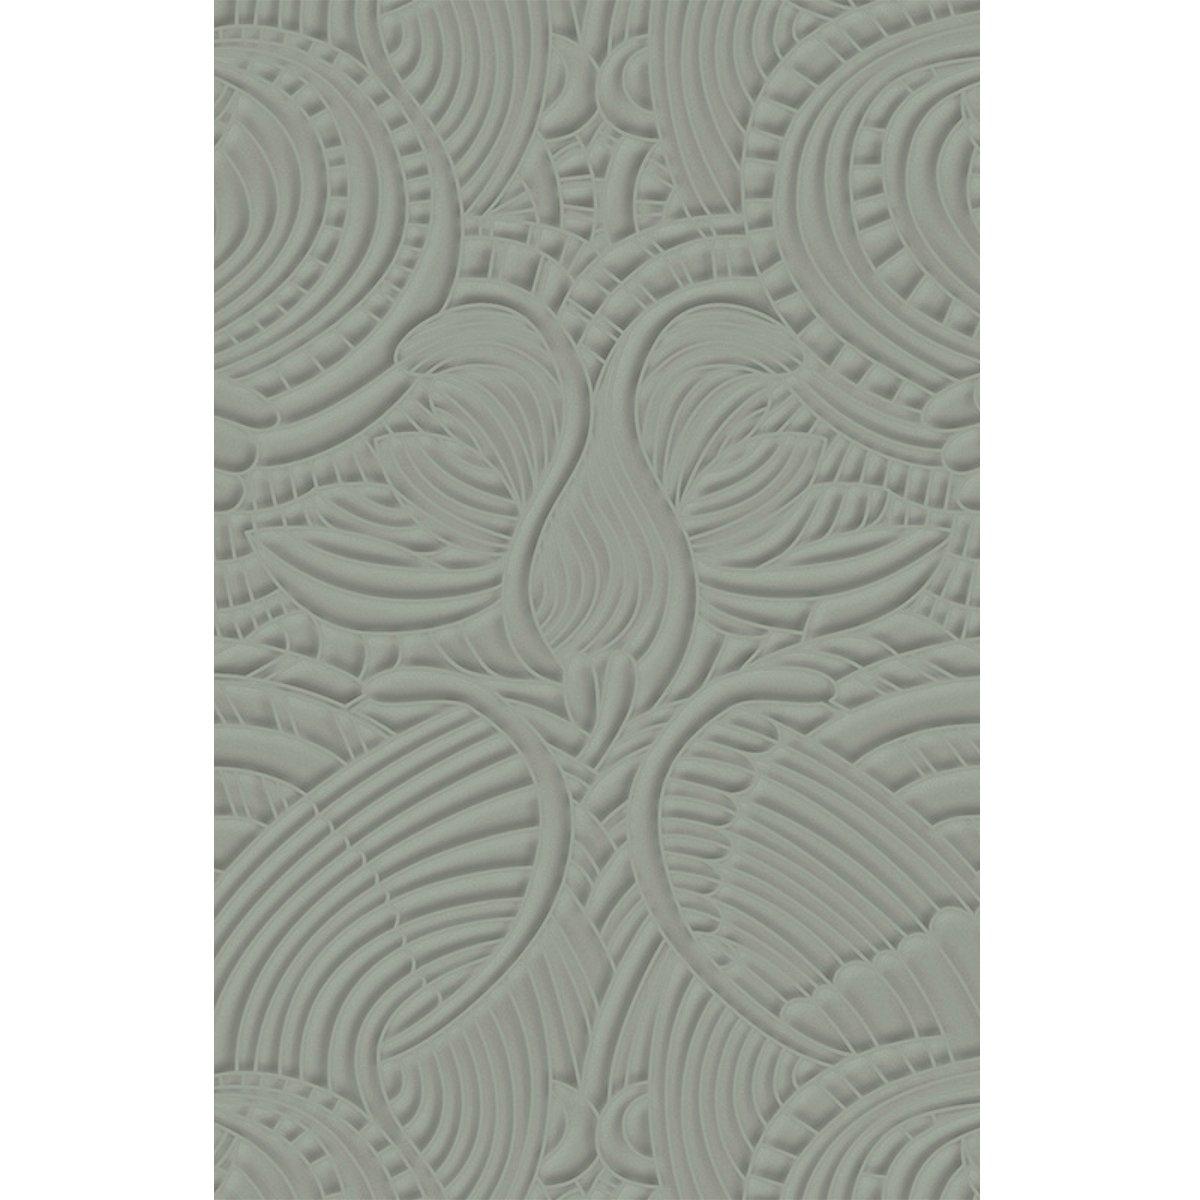 Moooi Dodo Pavone Behang Celadon - 2 meter